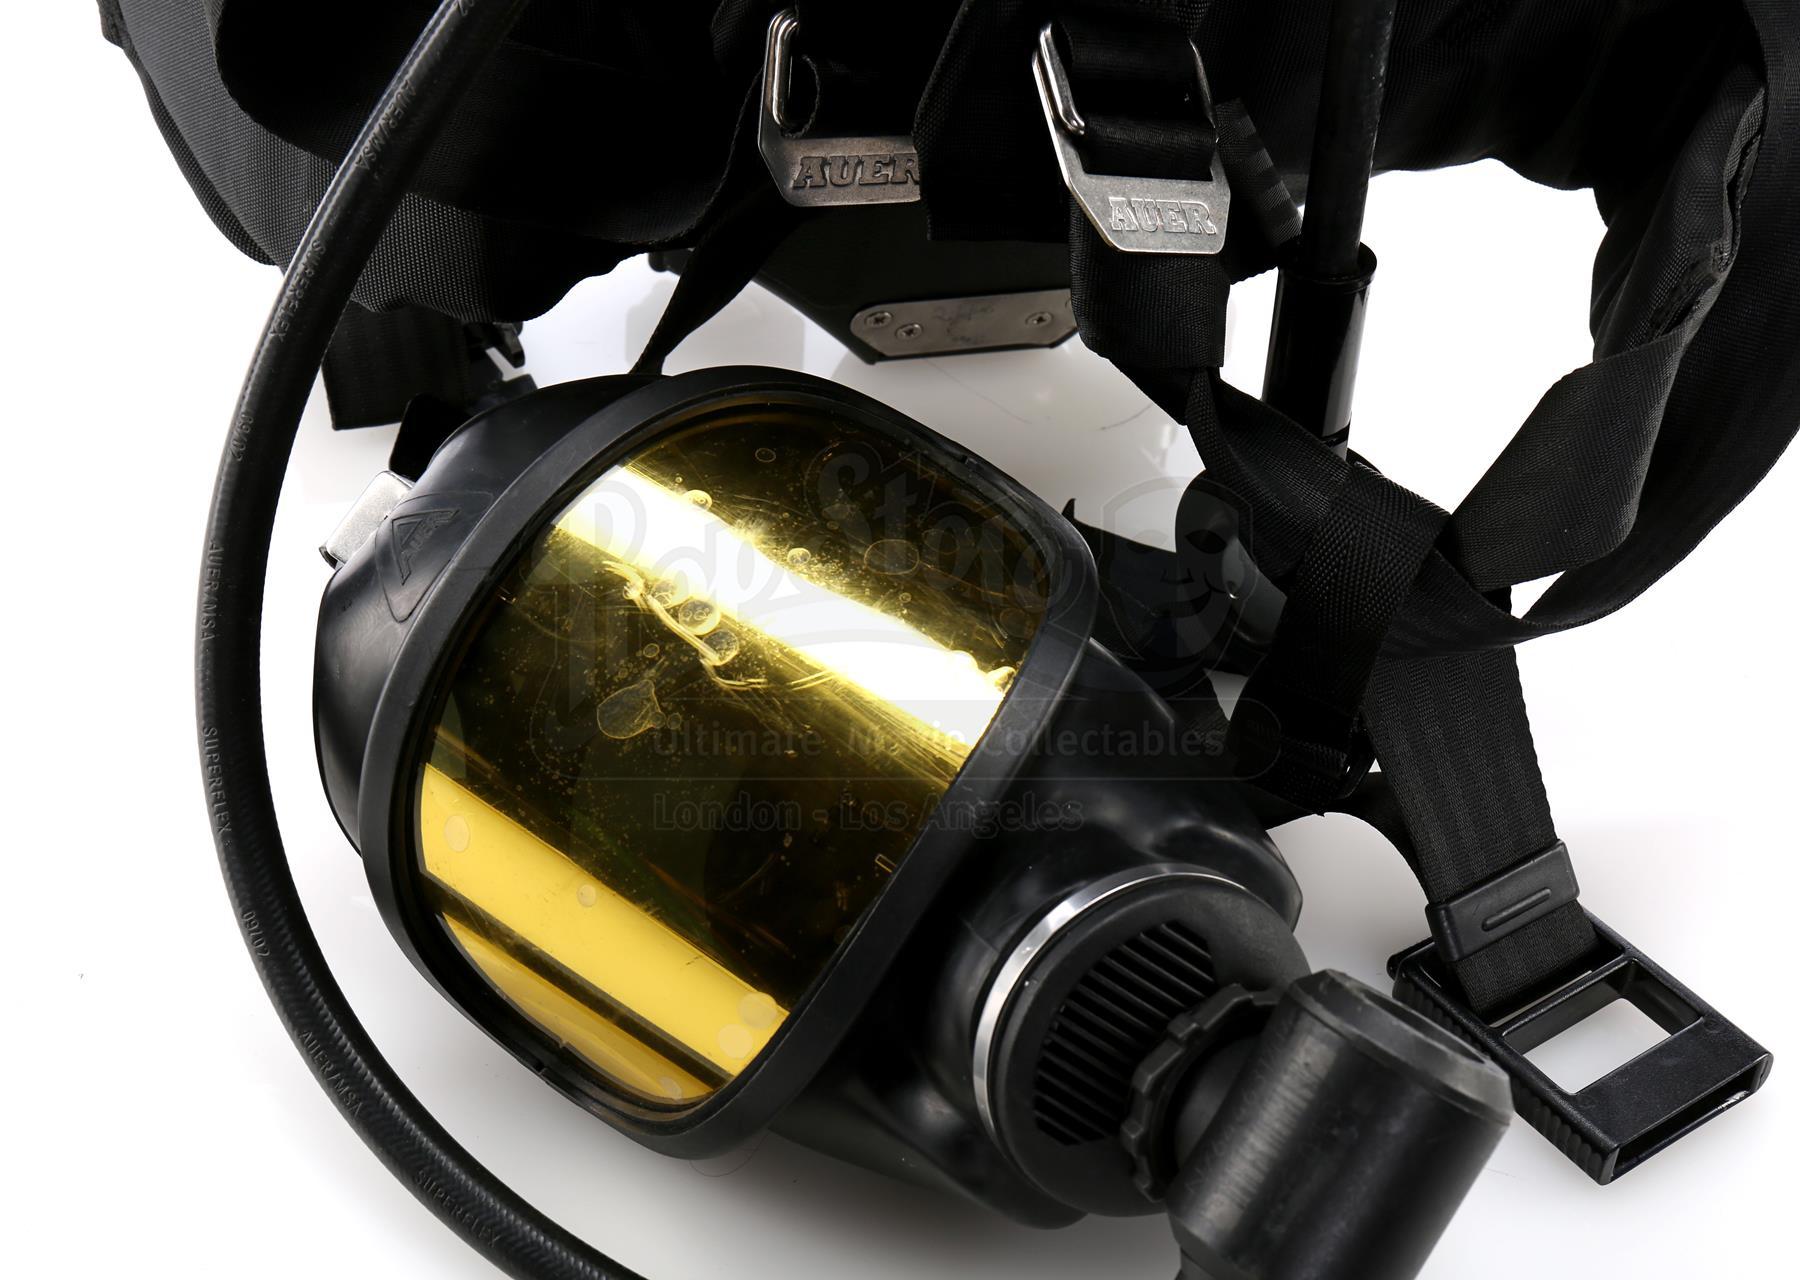 Various Episodes: BPO Hazmat Oxygen Tanks and Mask - Current price: $50